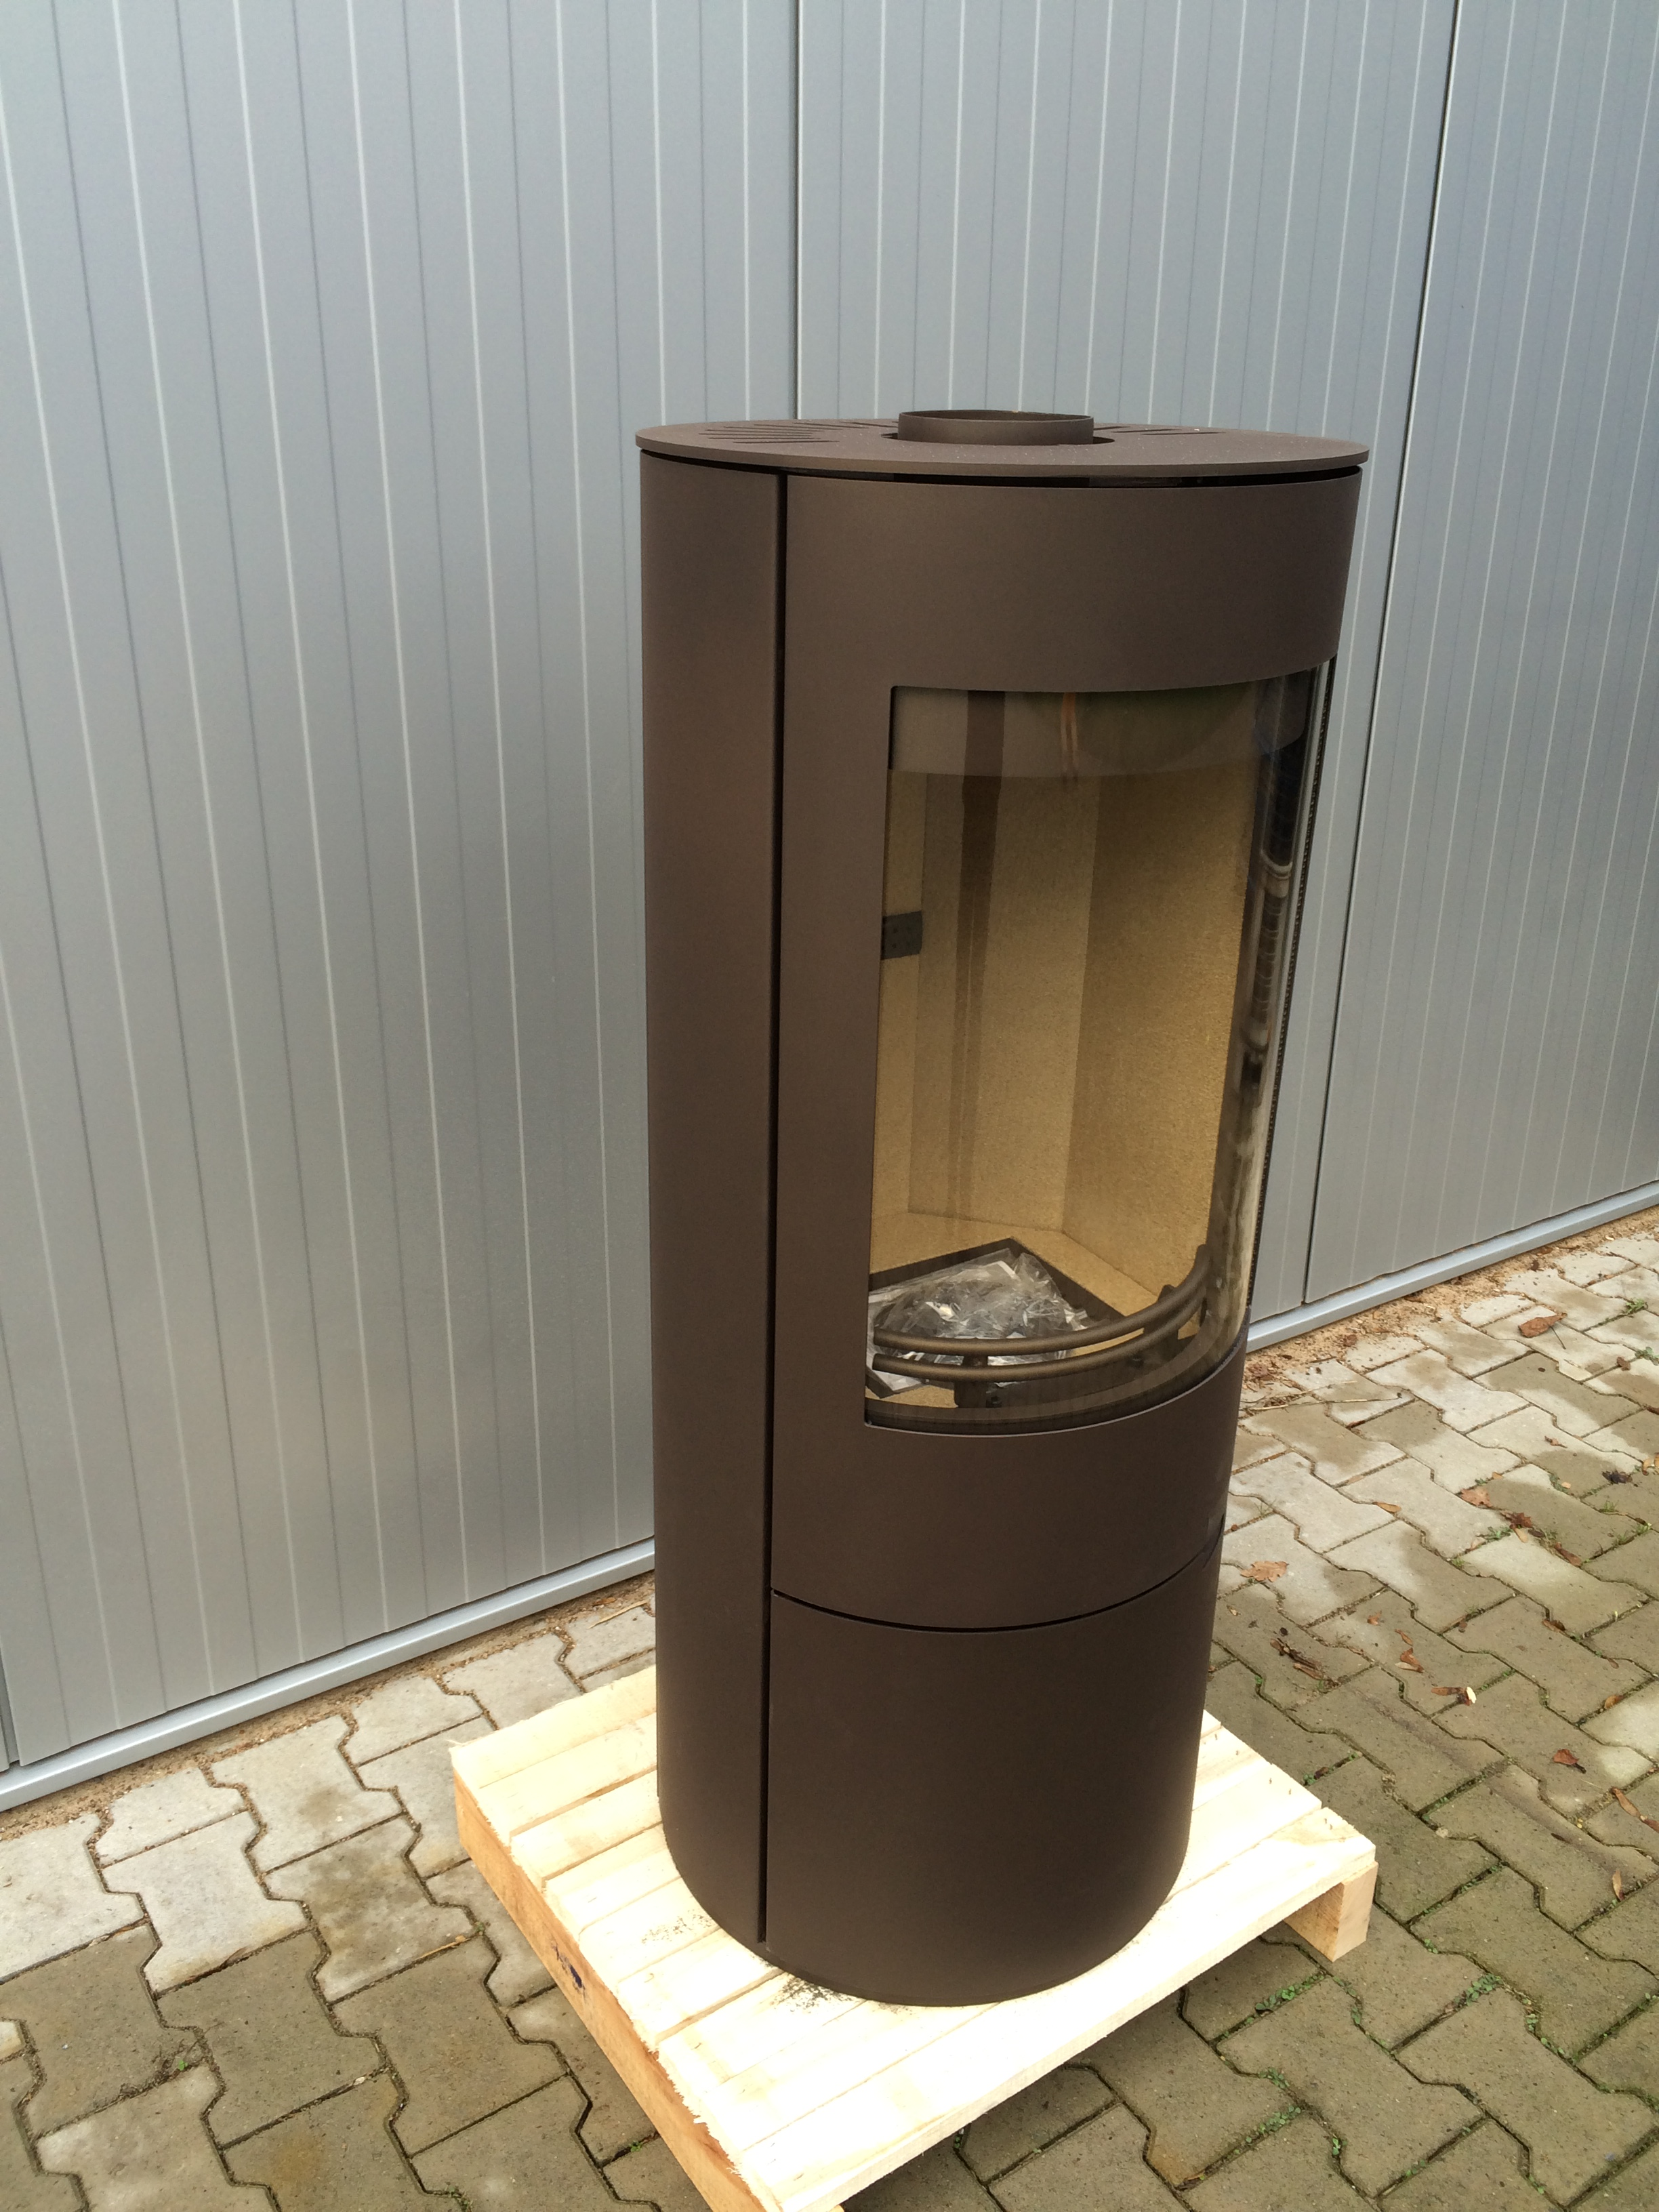 kaminofen kamin schwedenofen ofen h m evo stahl braun 2 wahl ebay. Black Bedroom Furniture Sets. Home Design Ideas